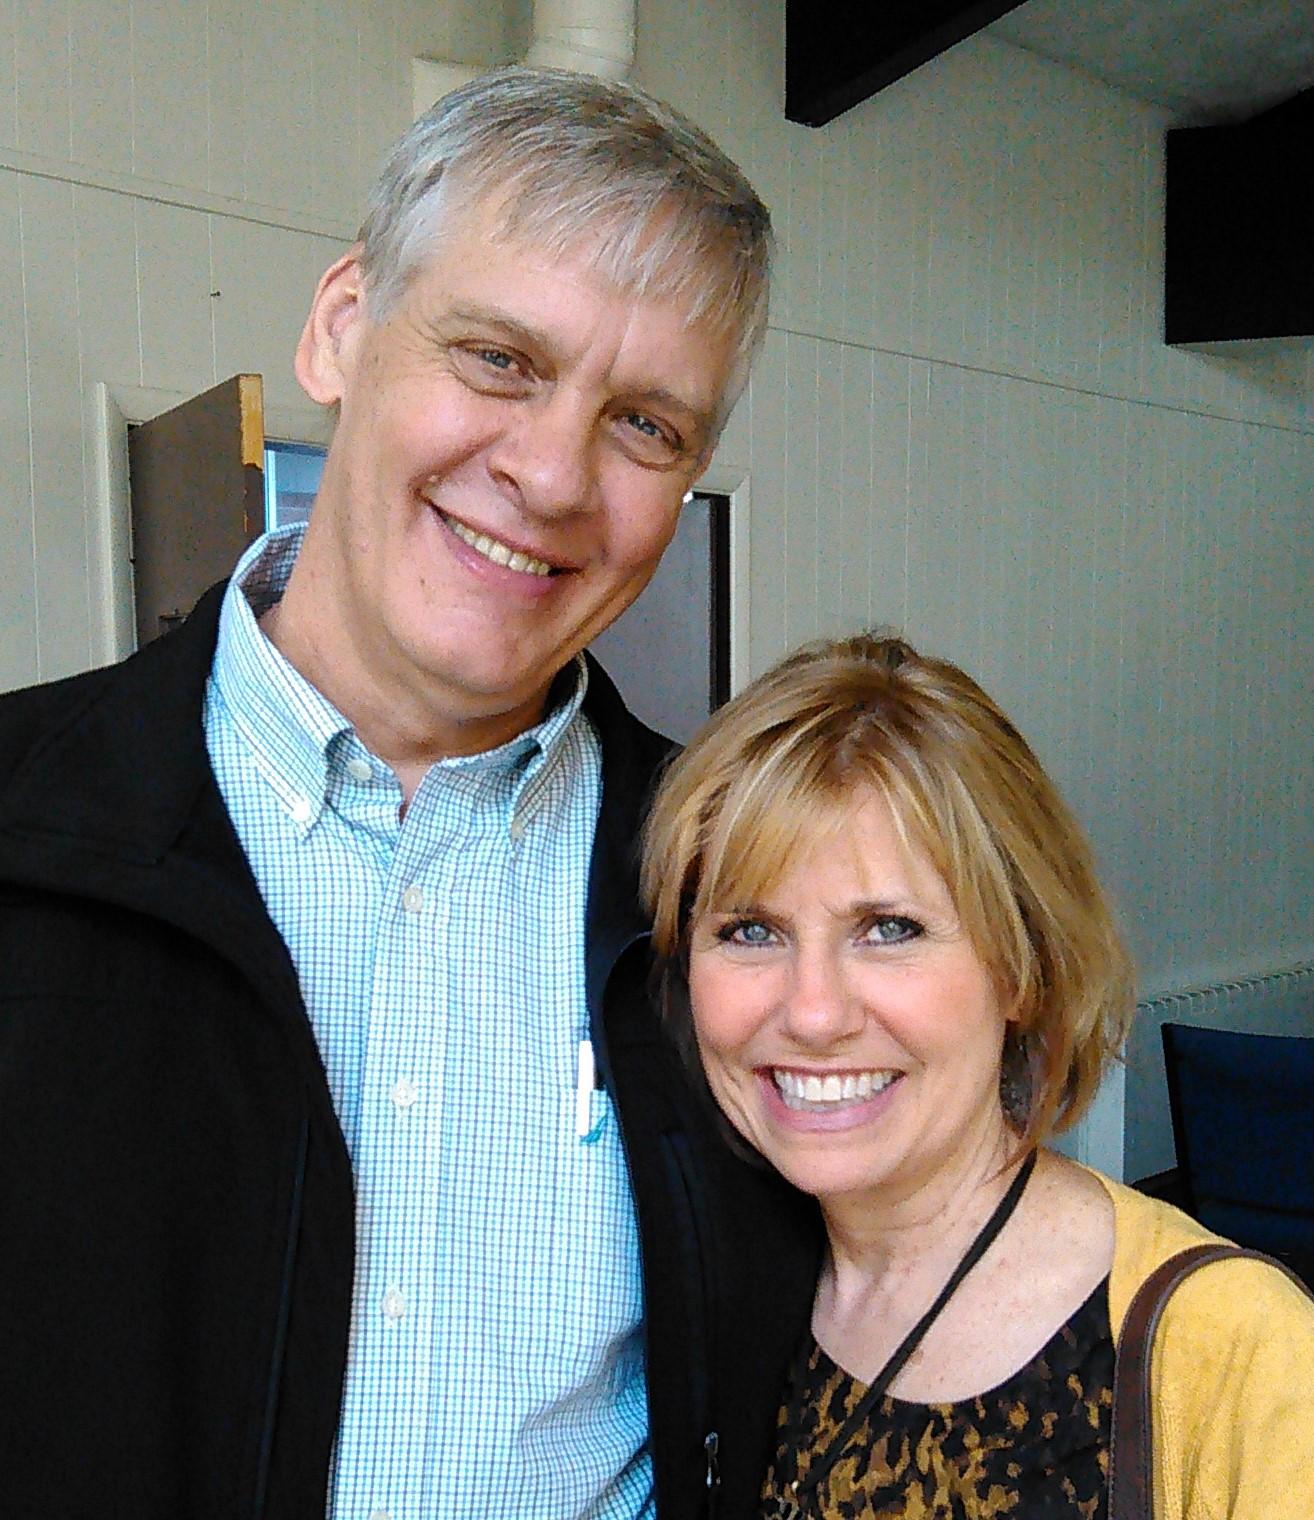 Stephen and Sheila Harrigan